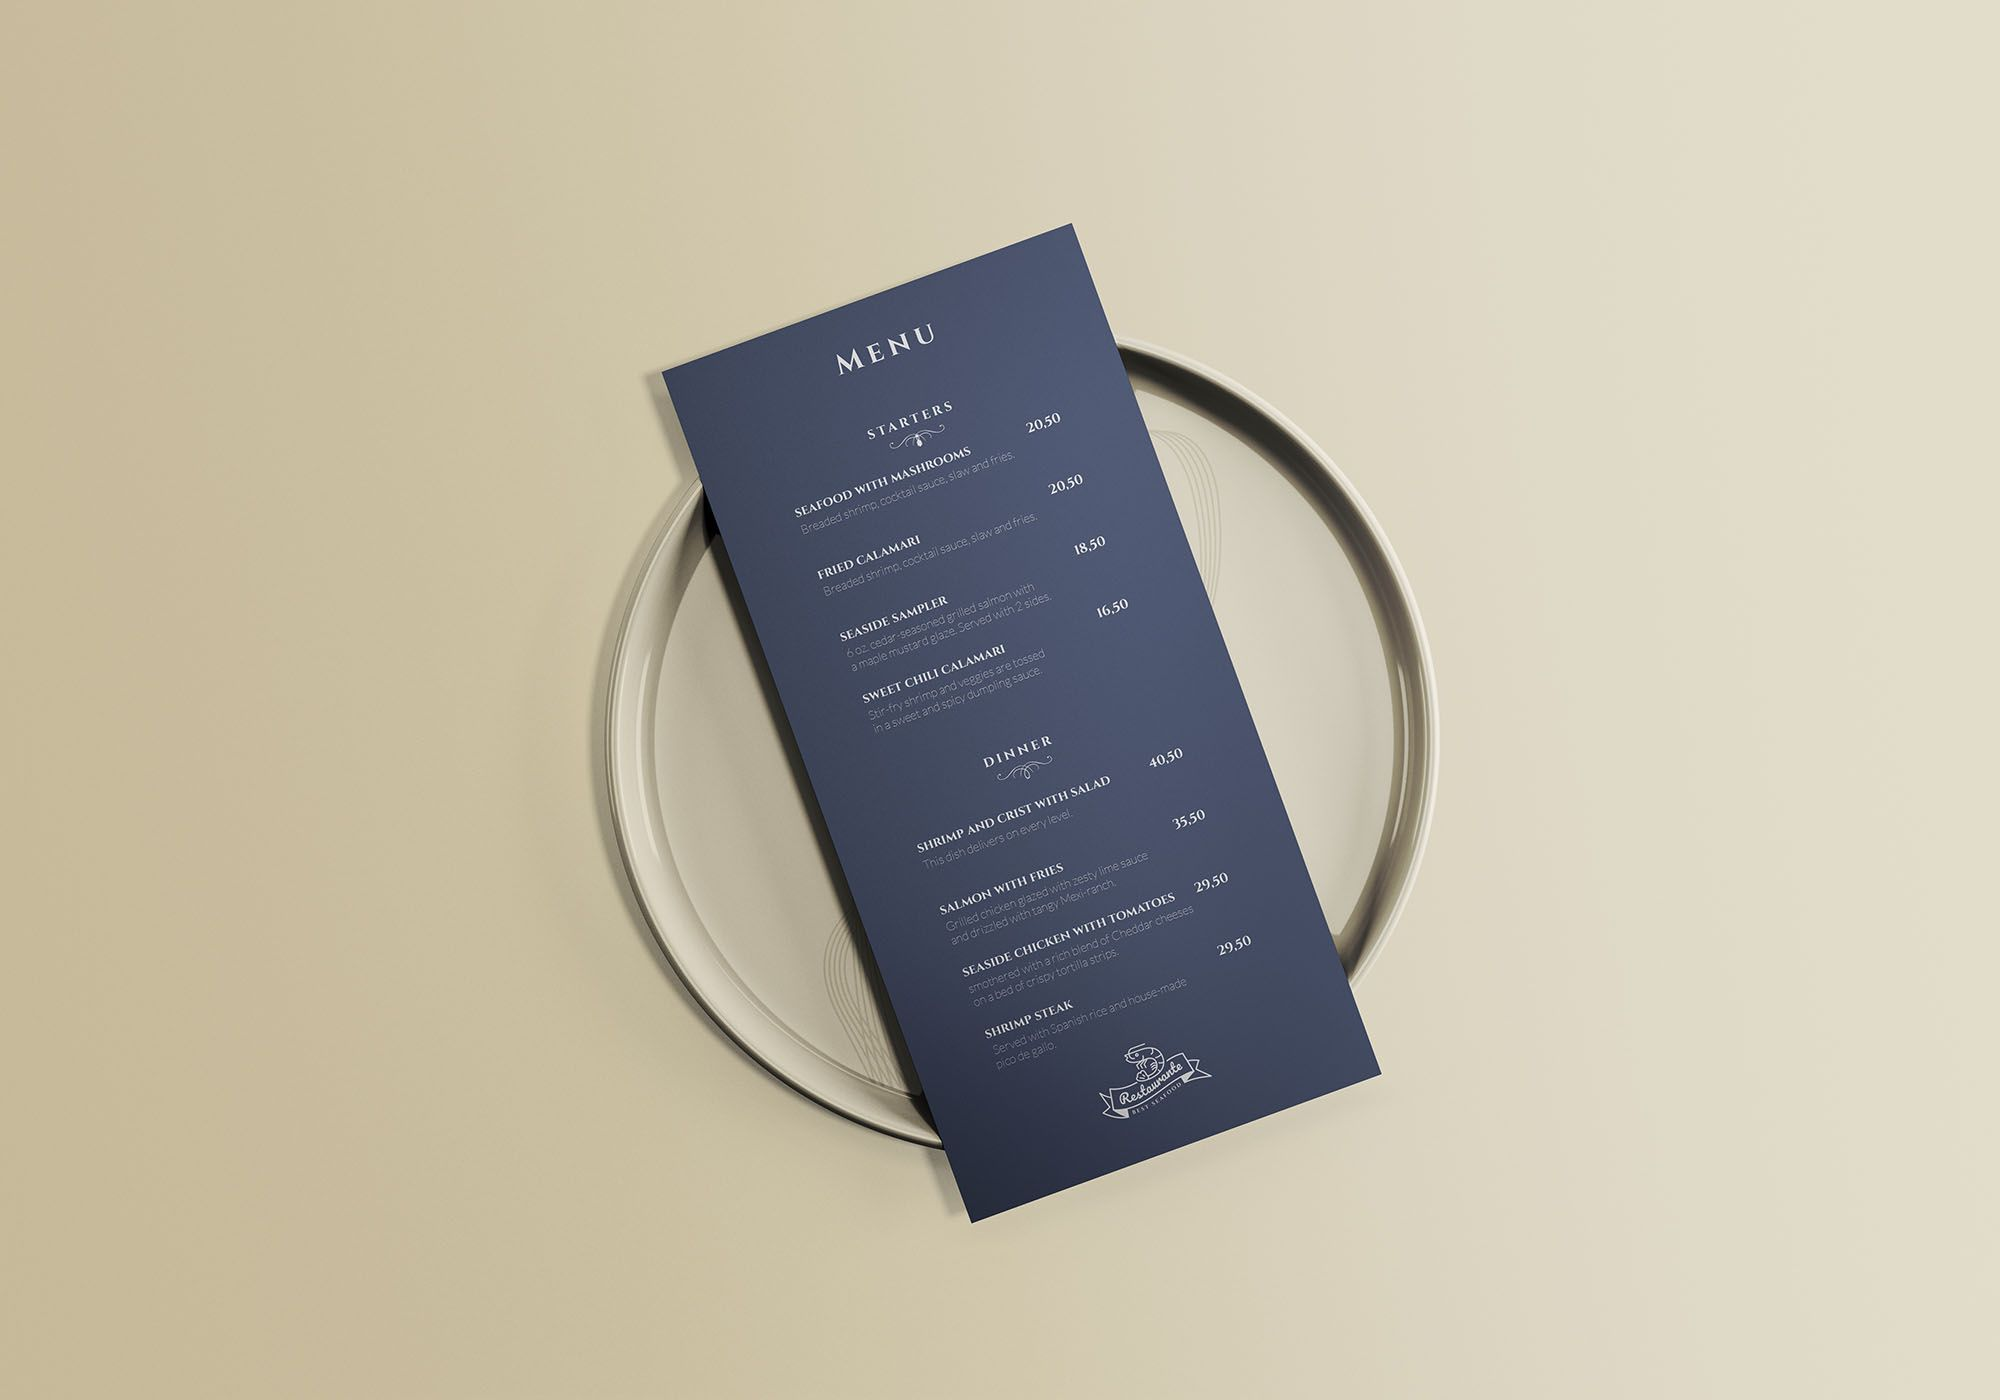 Free Restaurant Menu Mockup To Showcase Your Branding Cafe Menu Design In A Photorealistic Look Free Psd Mockup F Menu Mockup Menu Restaurant Menu Mockup Free